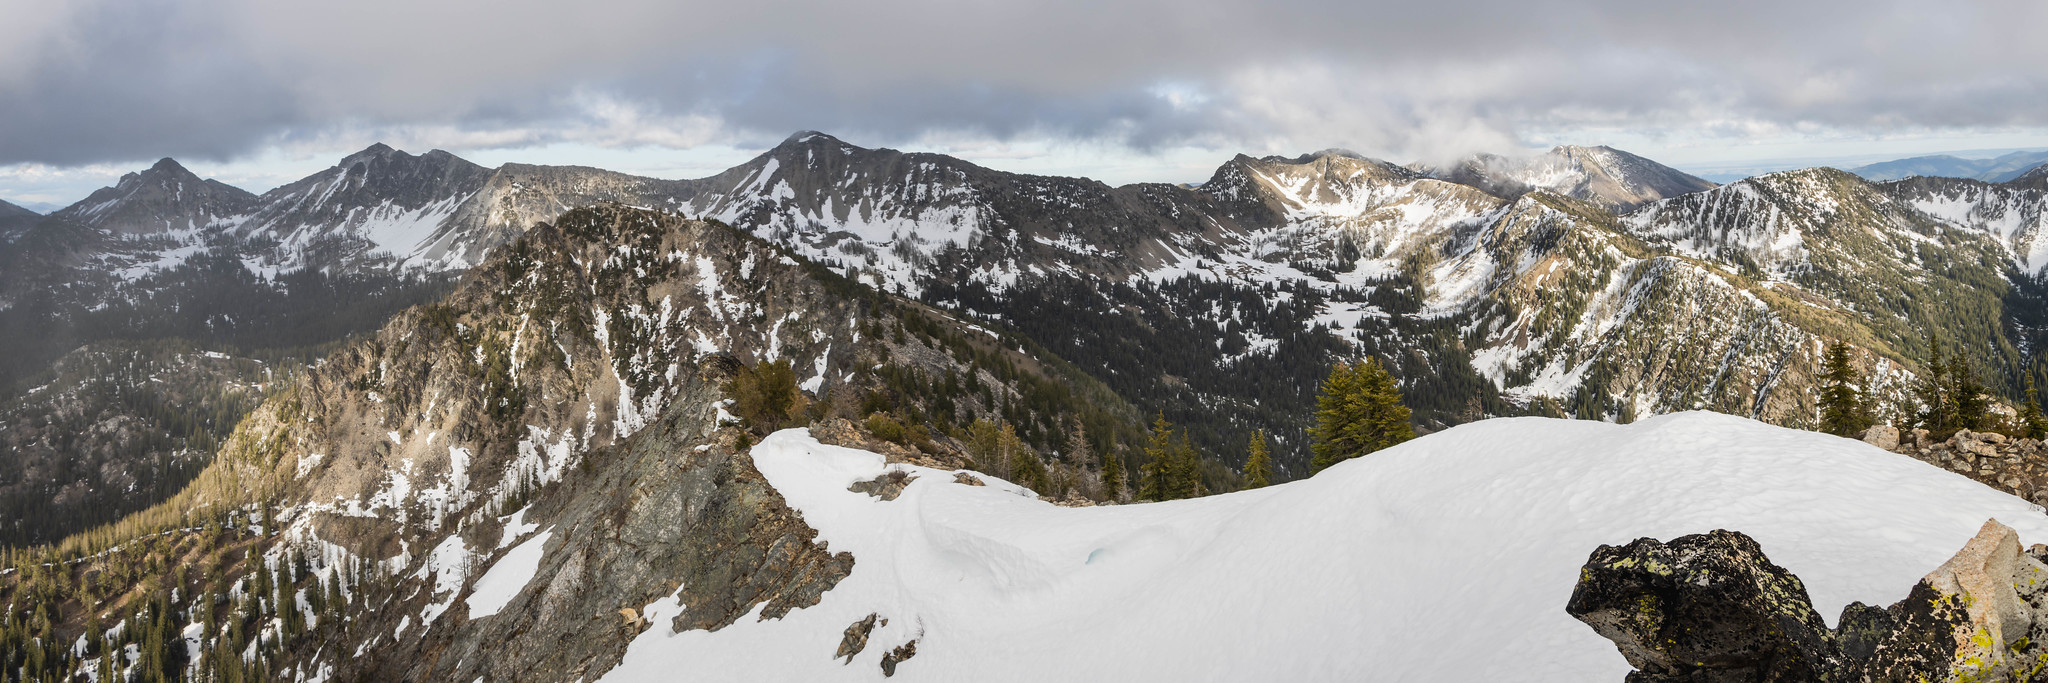 Sawtooth Ridge view on Old Maid Mountain